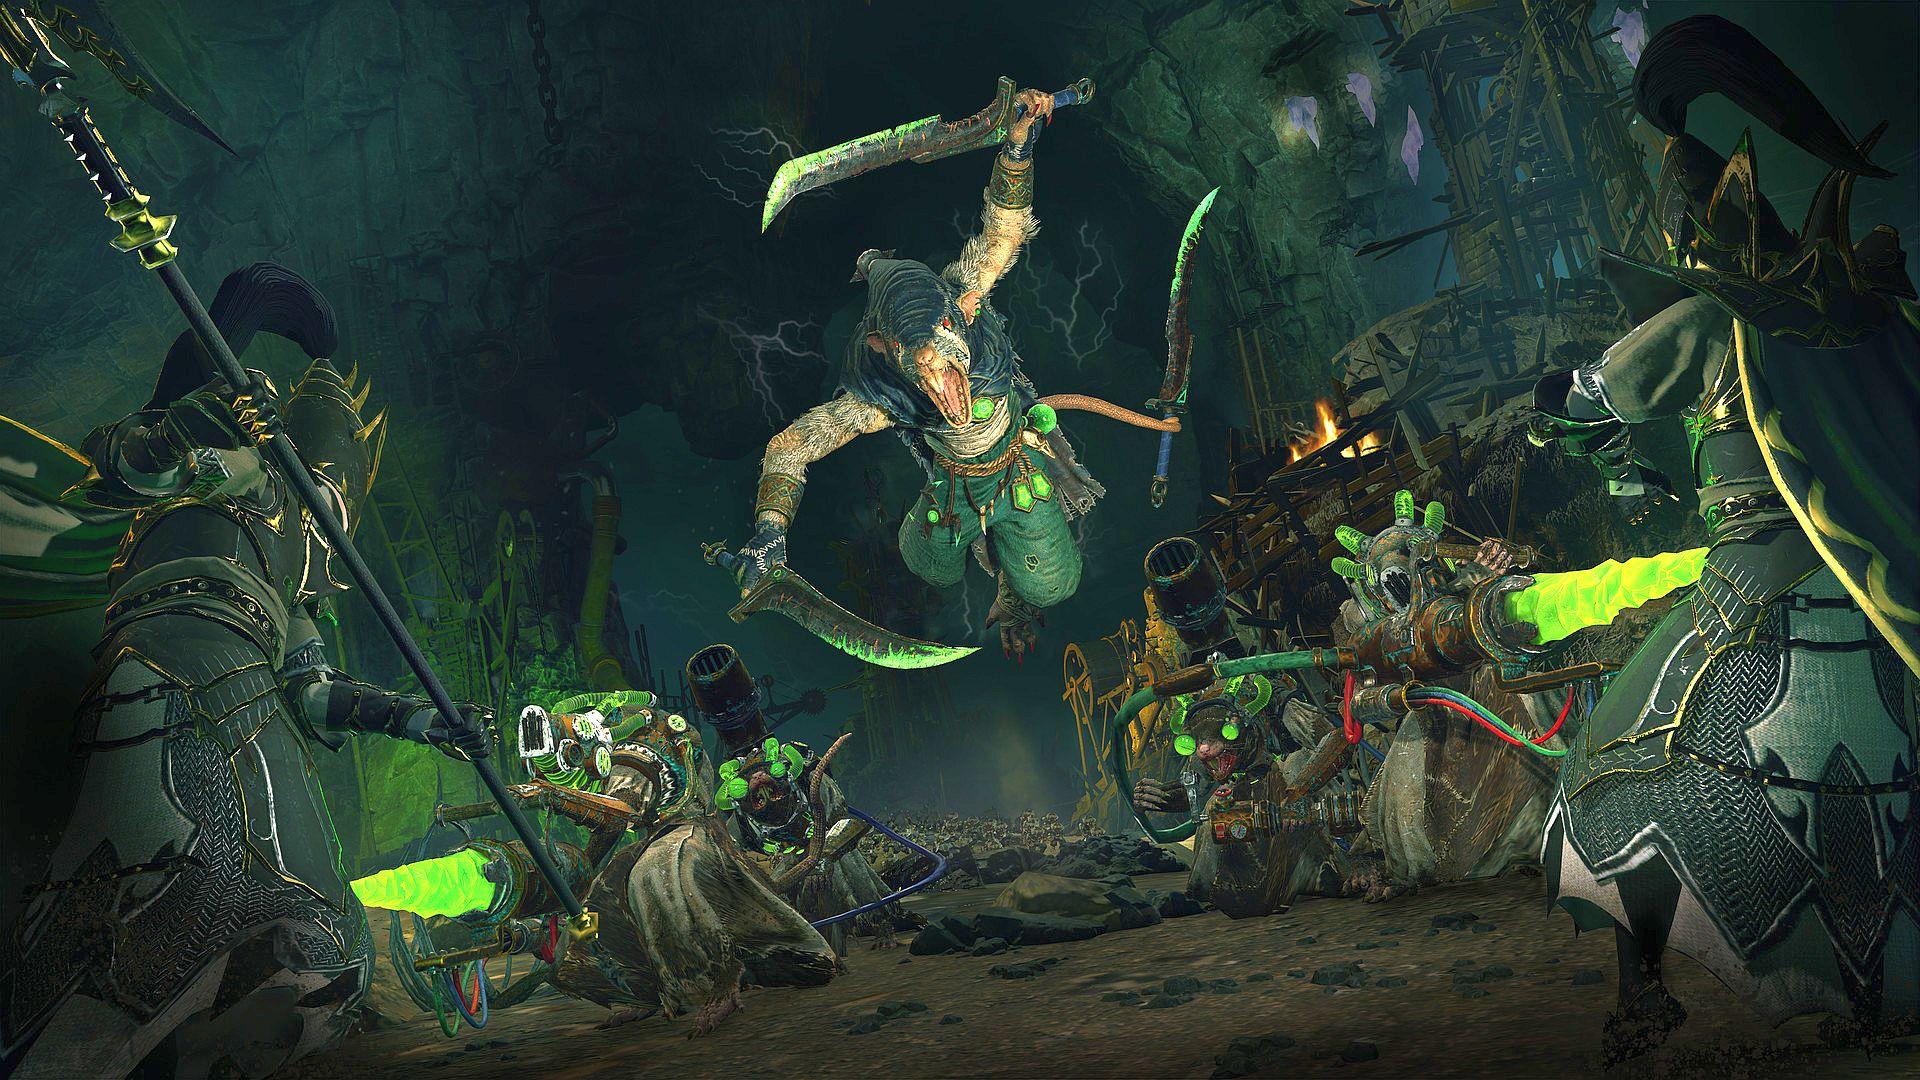 The Balletic Bloodshed Of Total War Warhammers Deathmaster